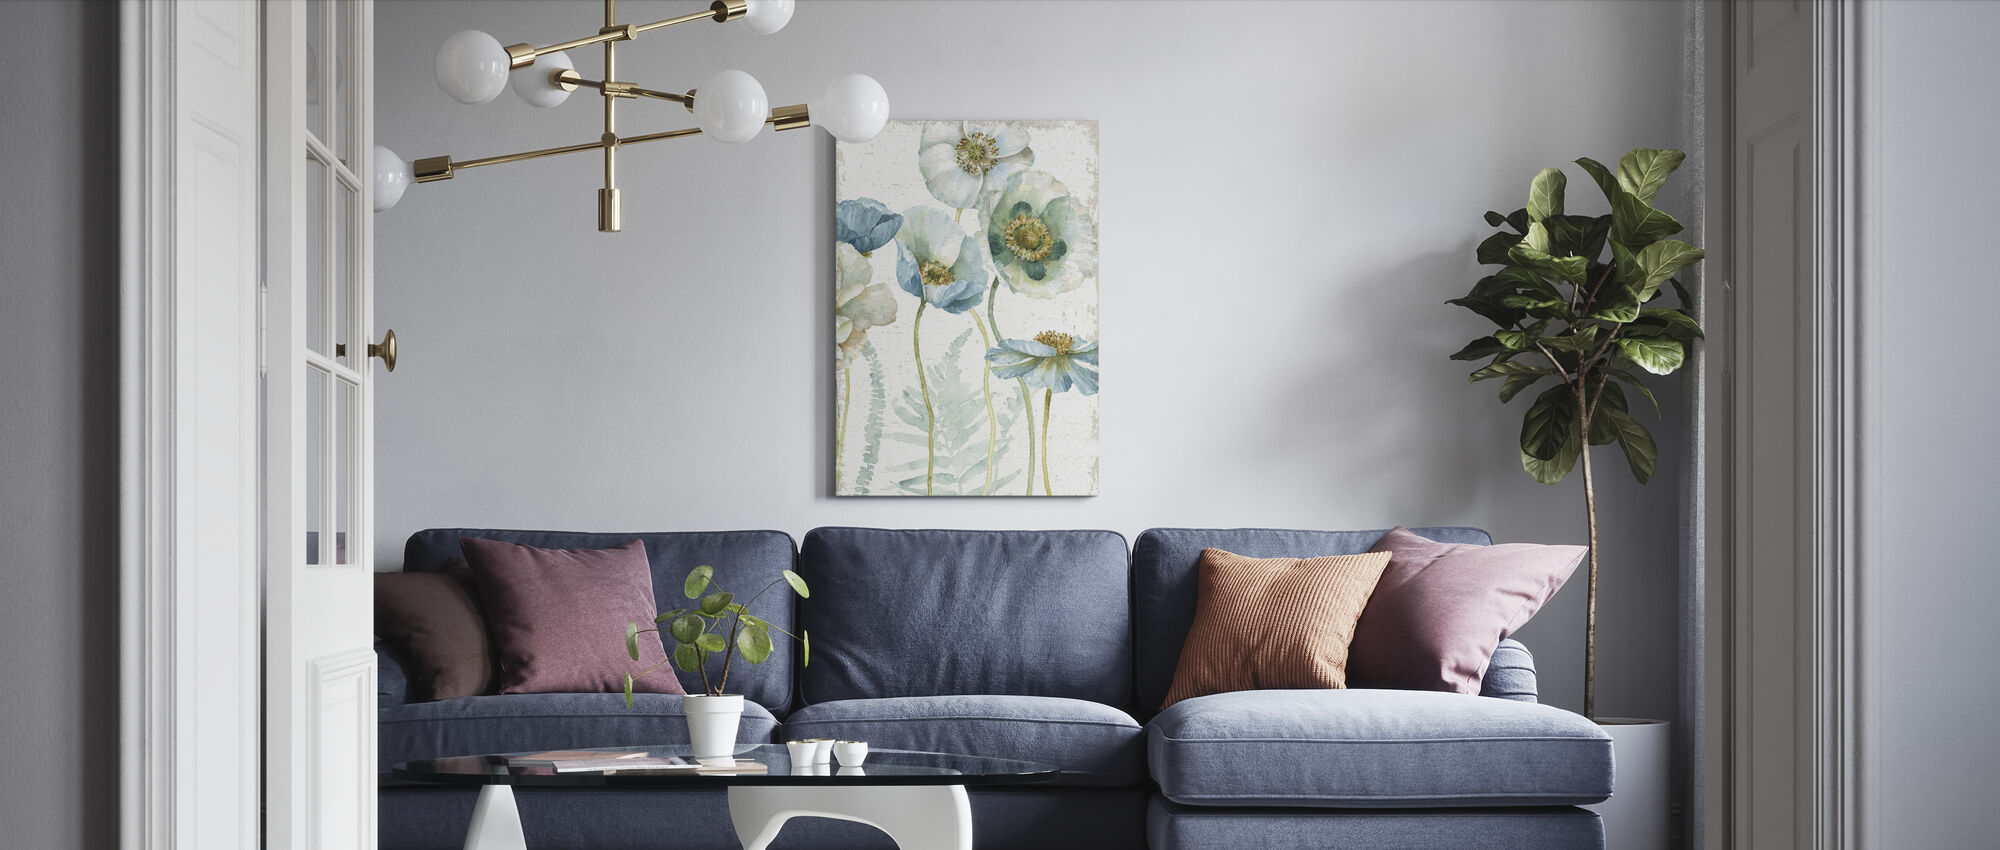 Mine drivhus Blomster På Tre - Lerretsbilde - Stue